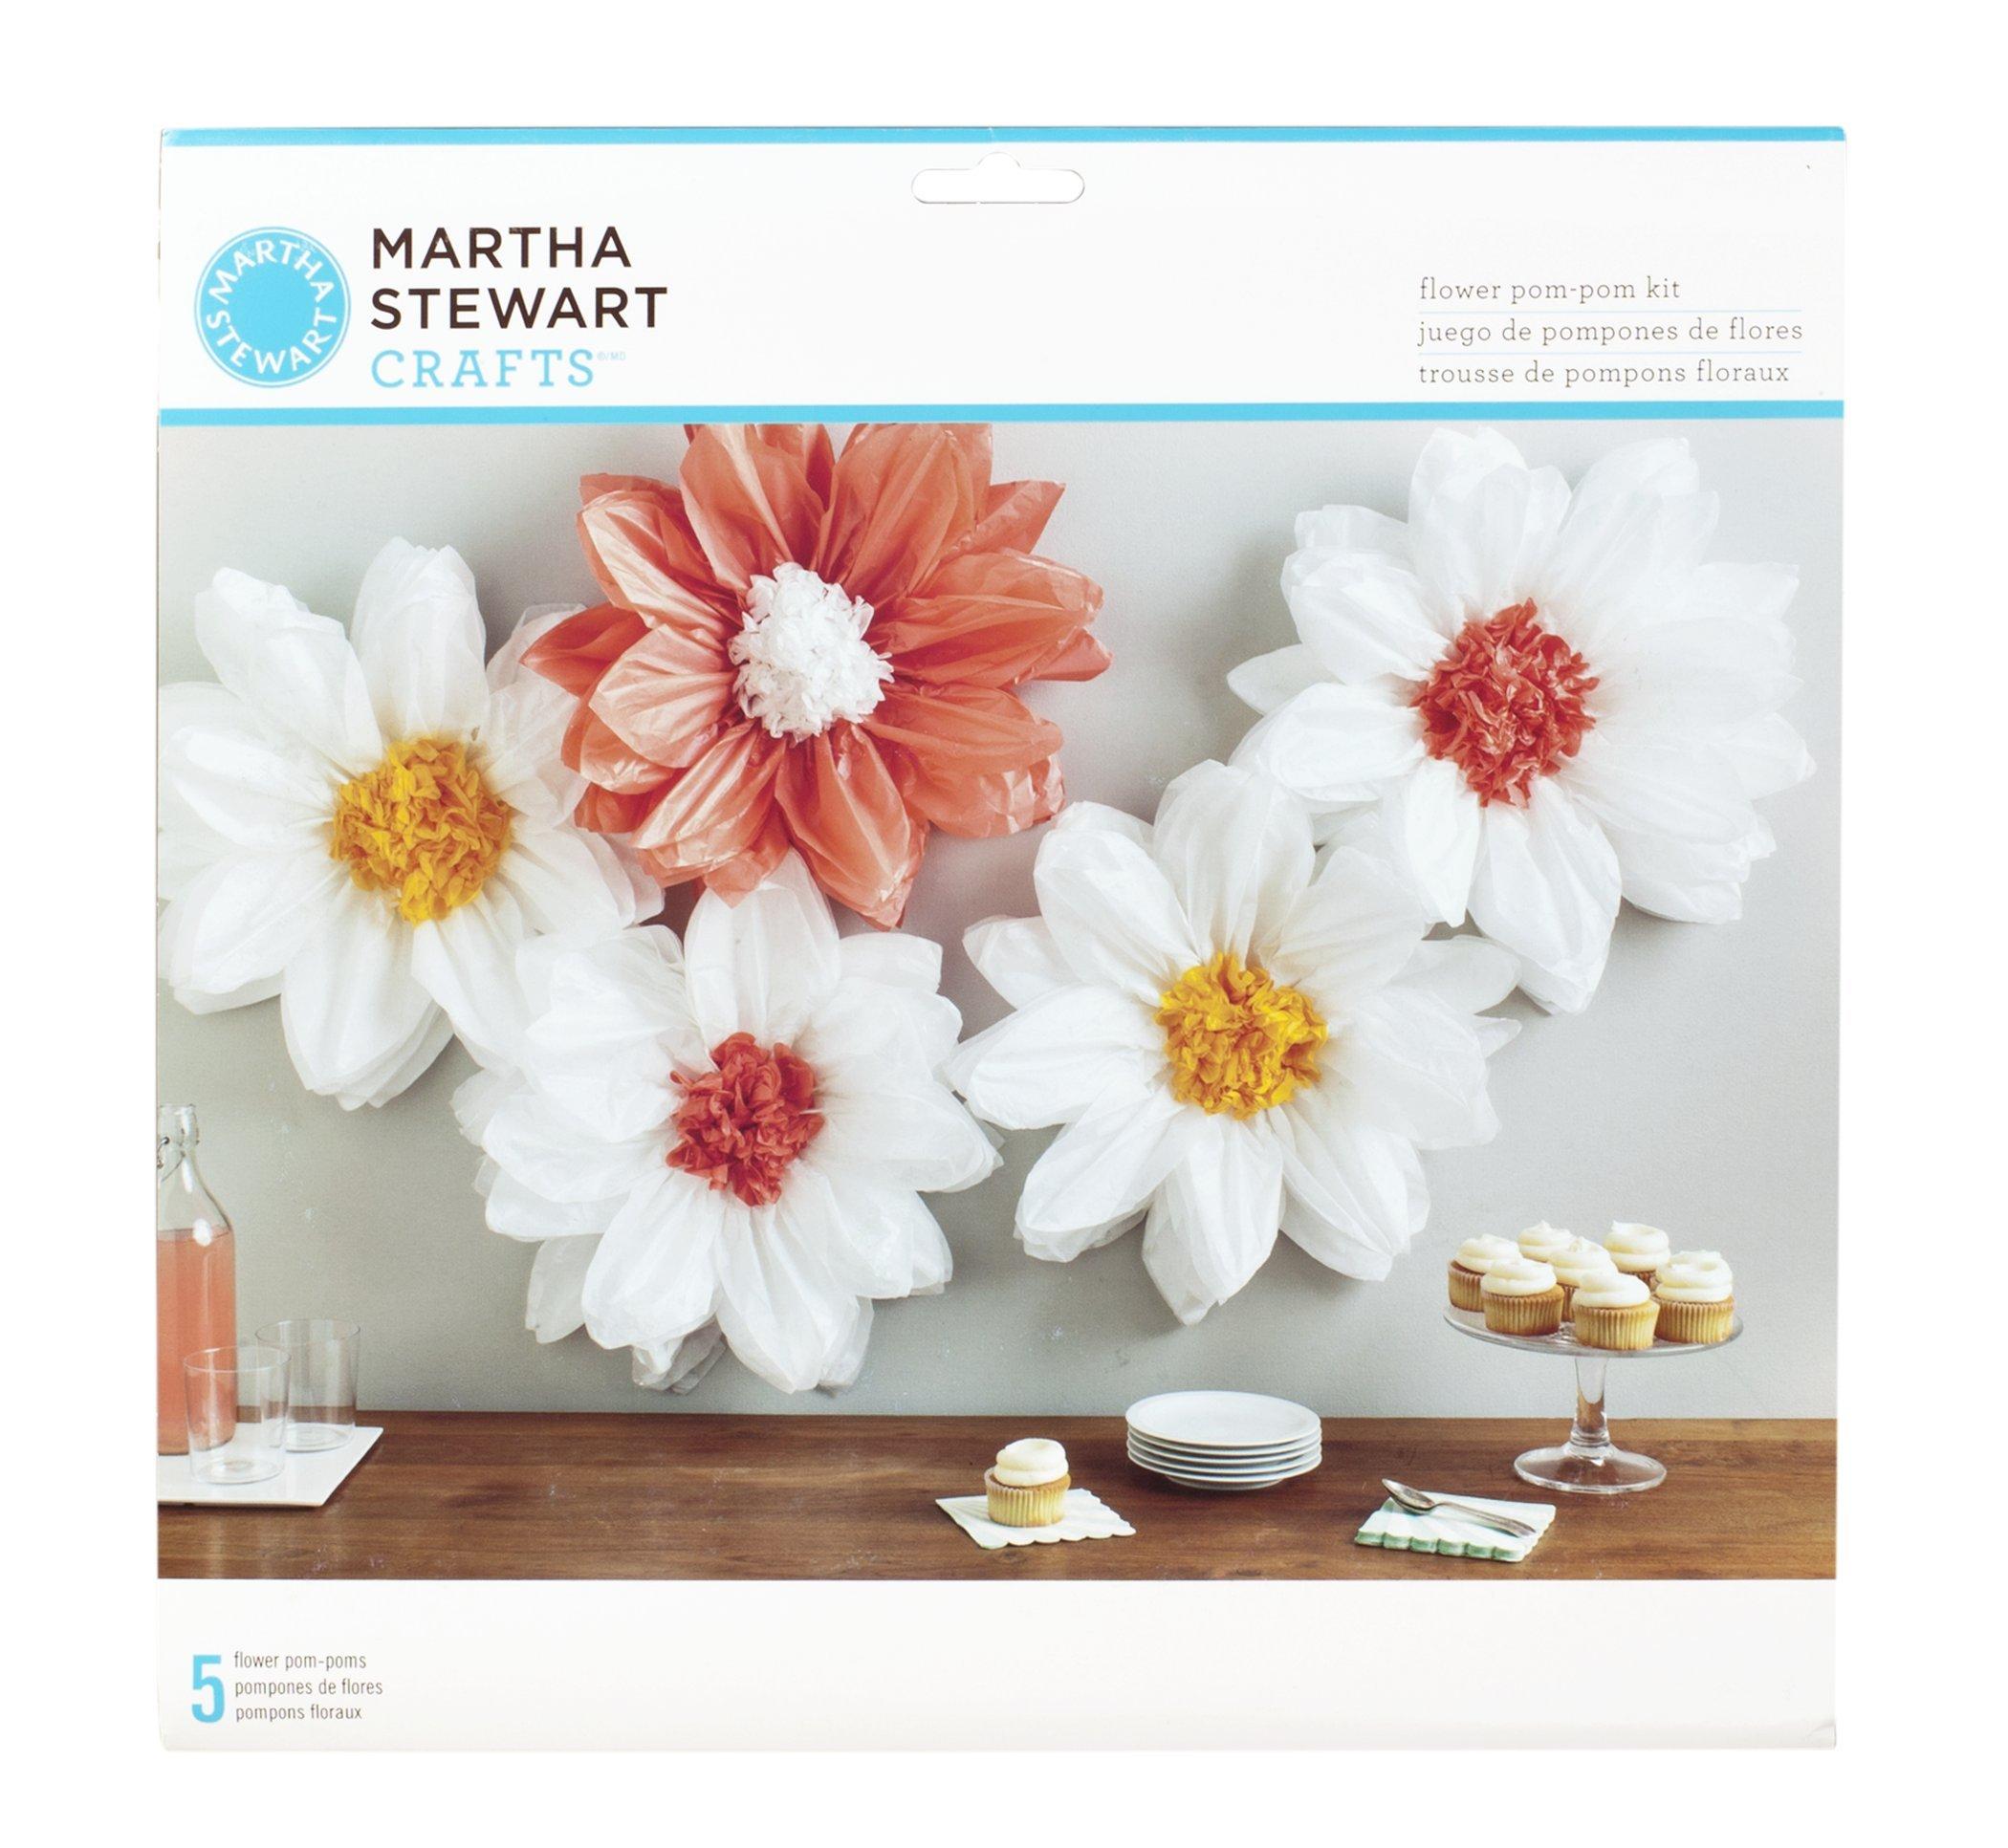 Martha Stewart Crafts 44-10219 Tissue Pom-Pom Kit, Peach and Pearl Daisies, White